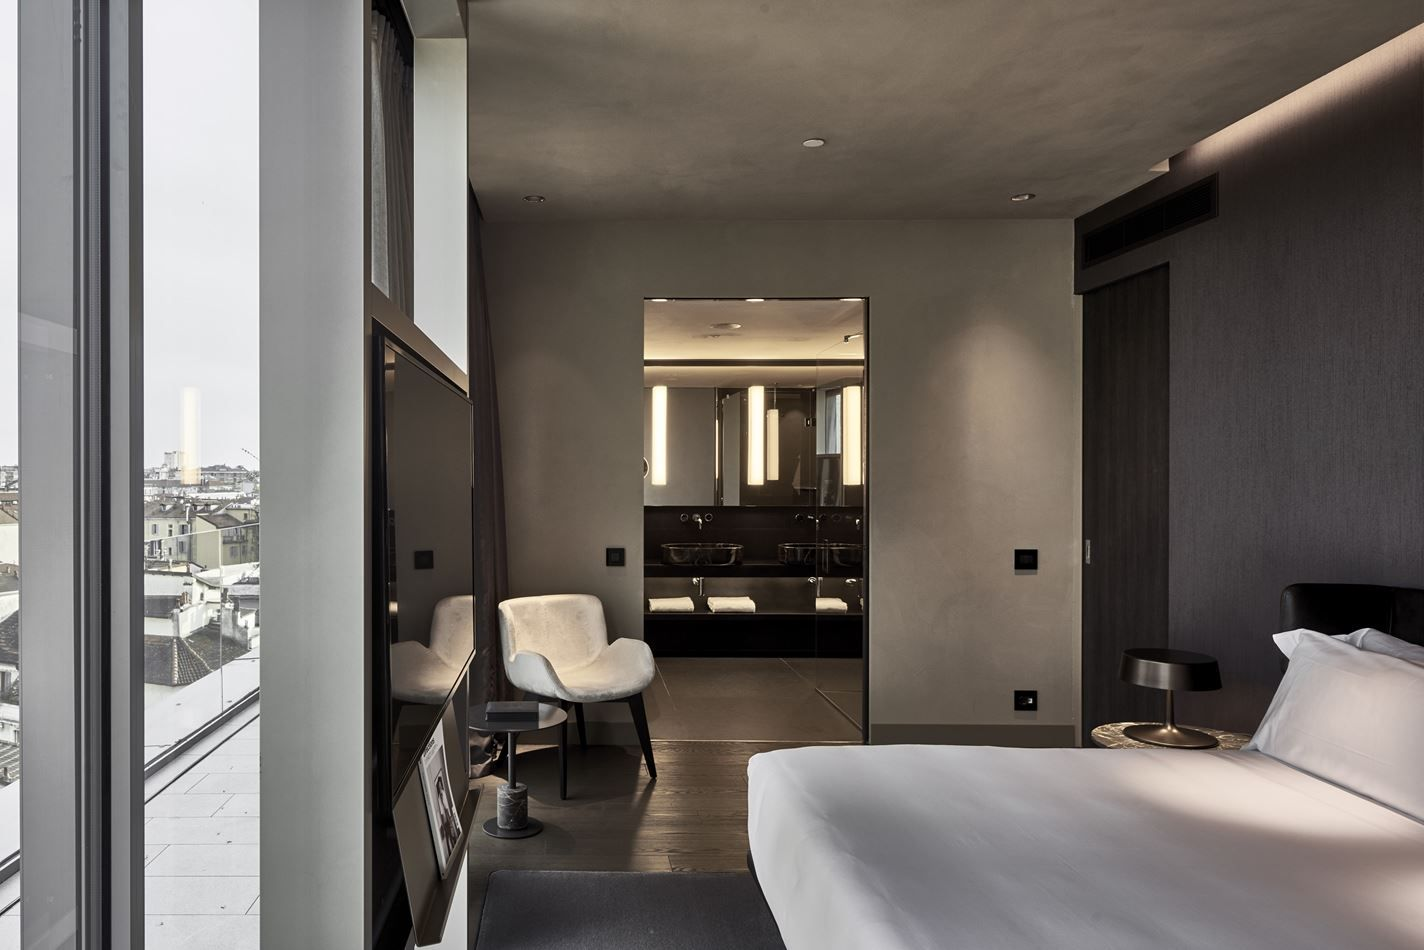 Hotel Viu Milan Picture Gallery